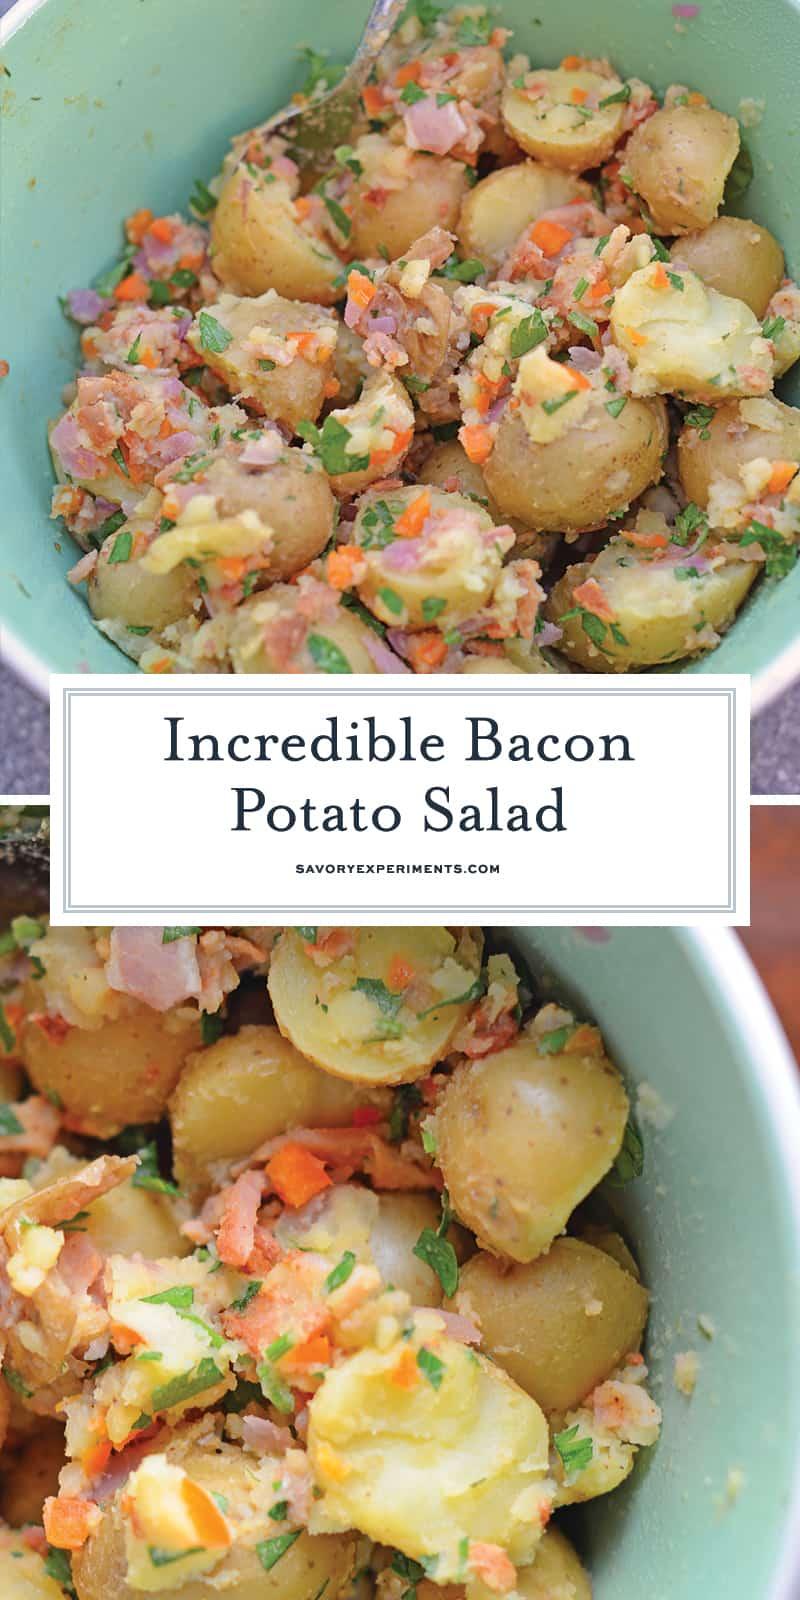 Bacon Potato Salad can be served hot or cold and uses veggies and BACON! This is a NO MAYO potato salad! The perfect make ahead side dish. #potatosalad #nomayopotatosalad www.savoryexperiments.com